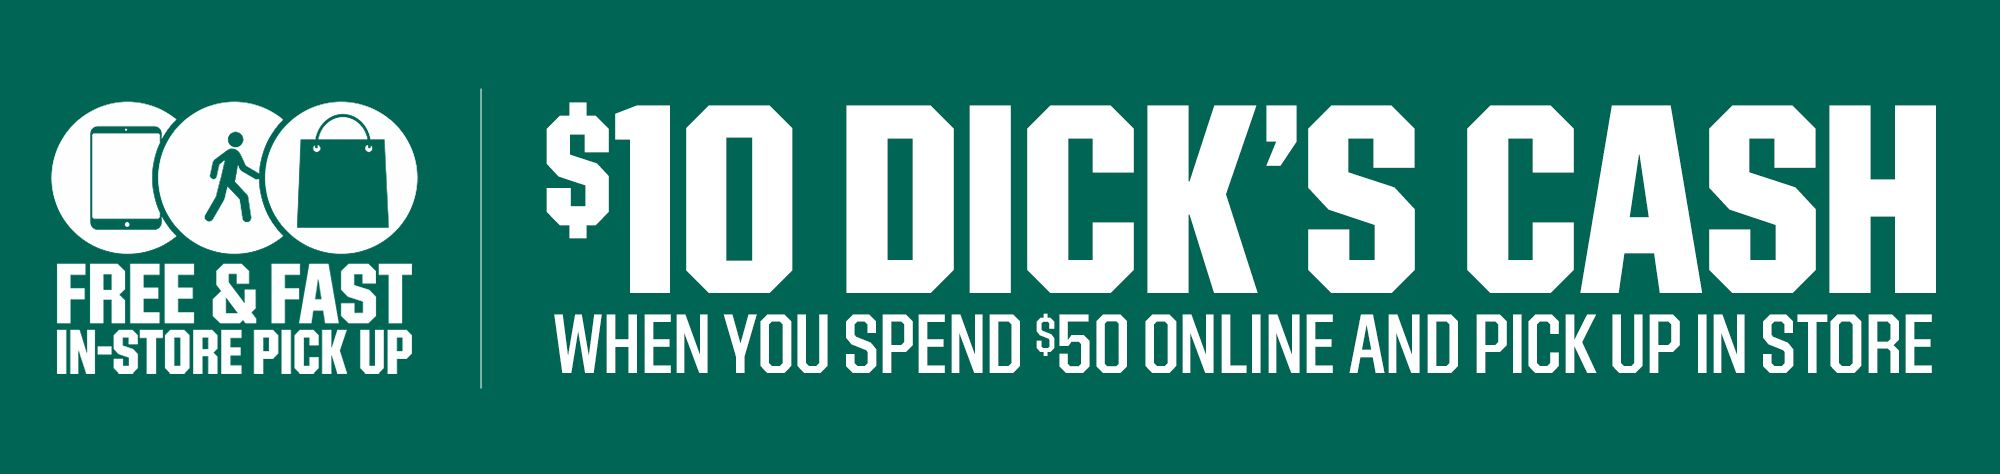 dicks cash